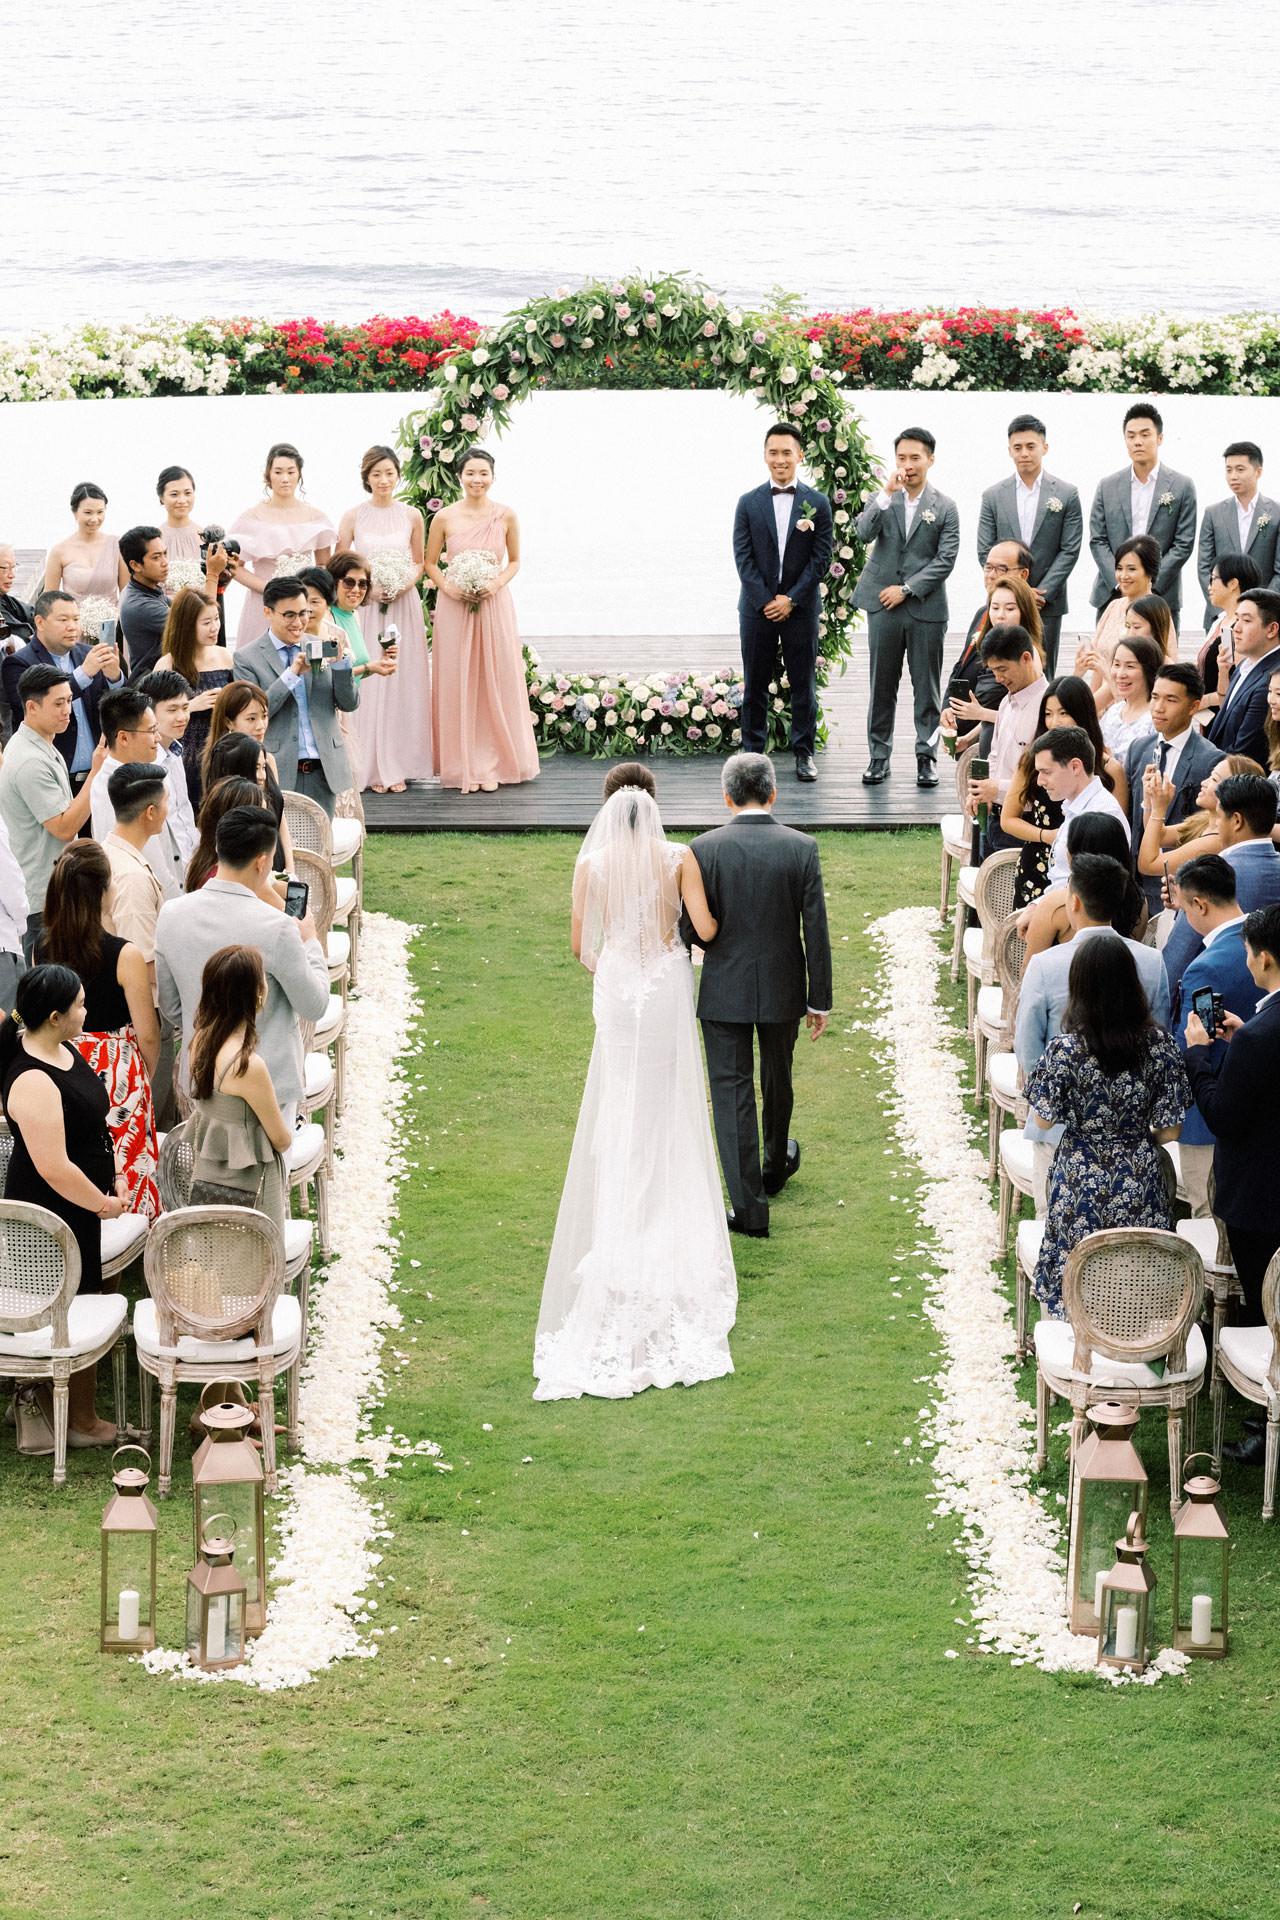 Uluwatu Cliff Wedding with Chinese Wedding Ceremony 23